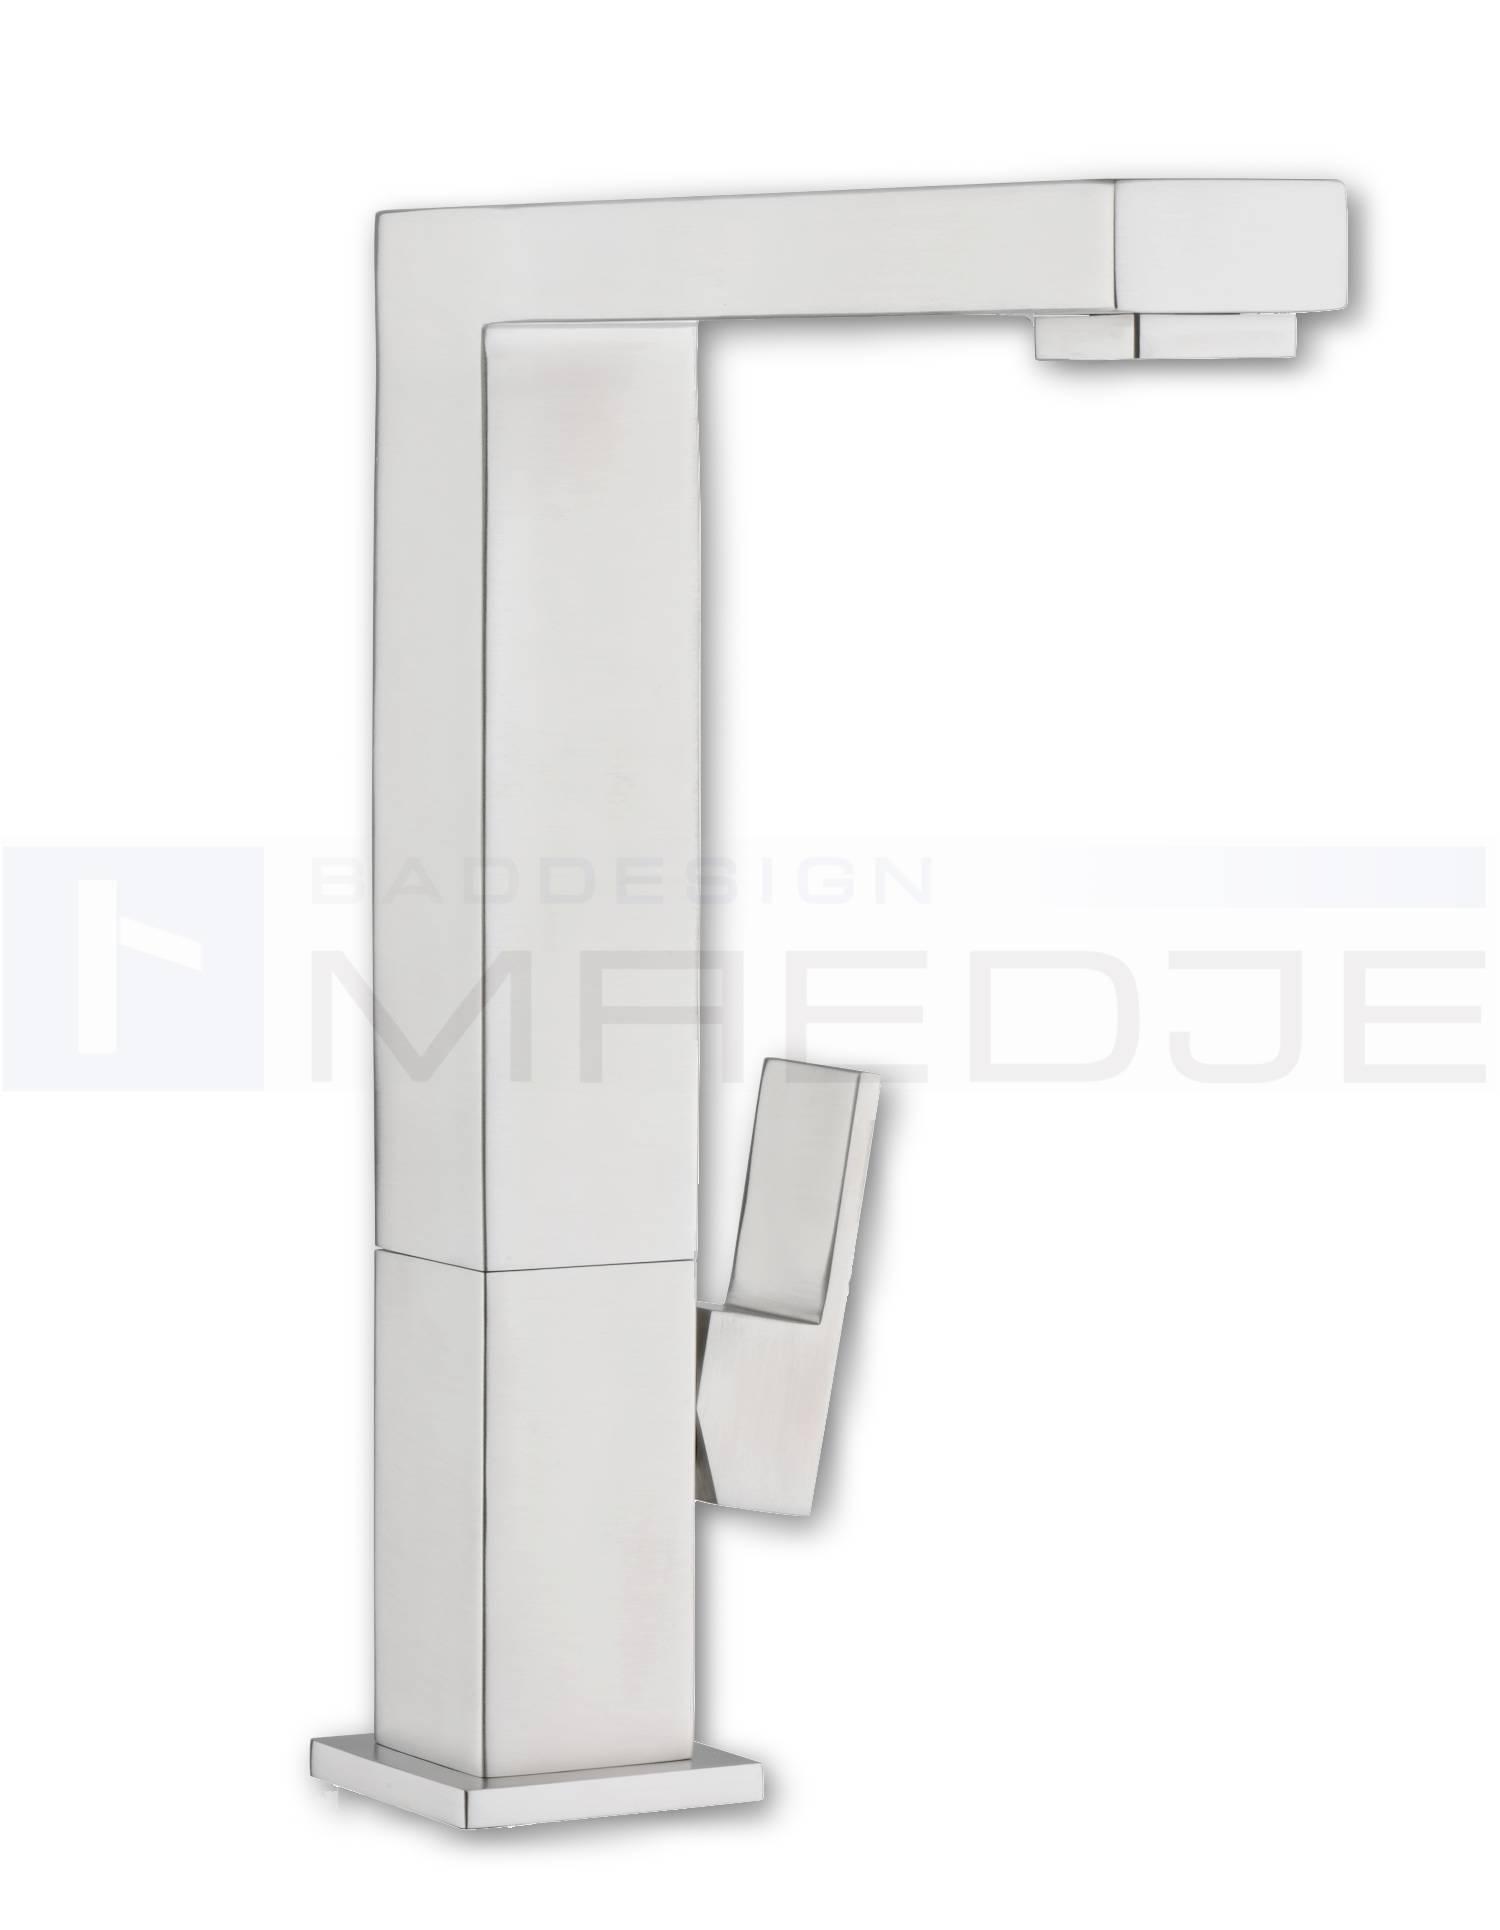 Design Quadro Edelstahl Küchen Armatur Eckig